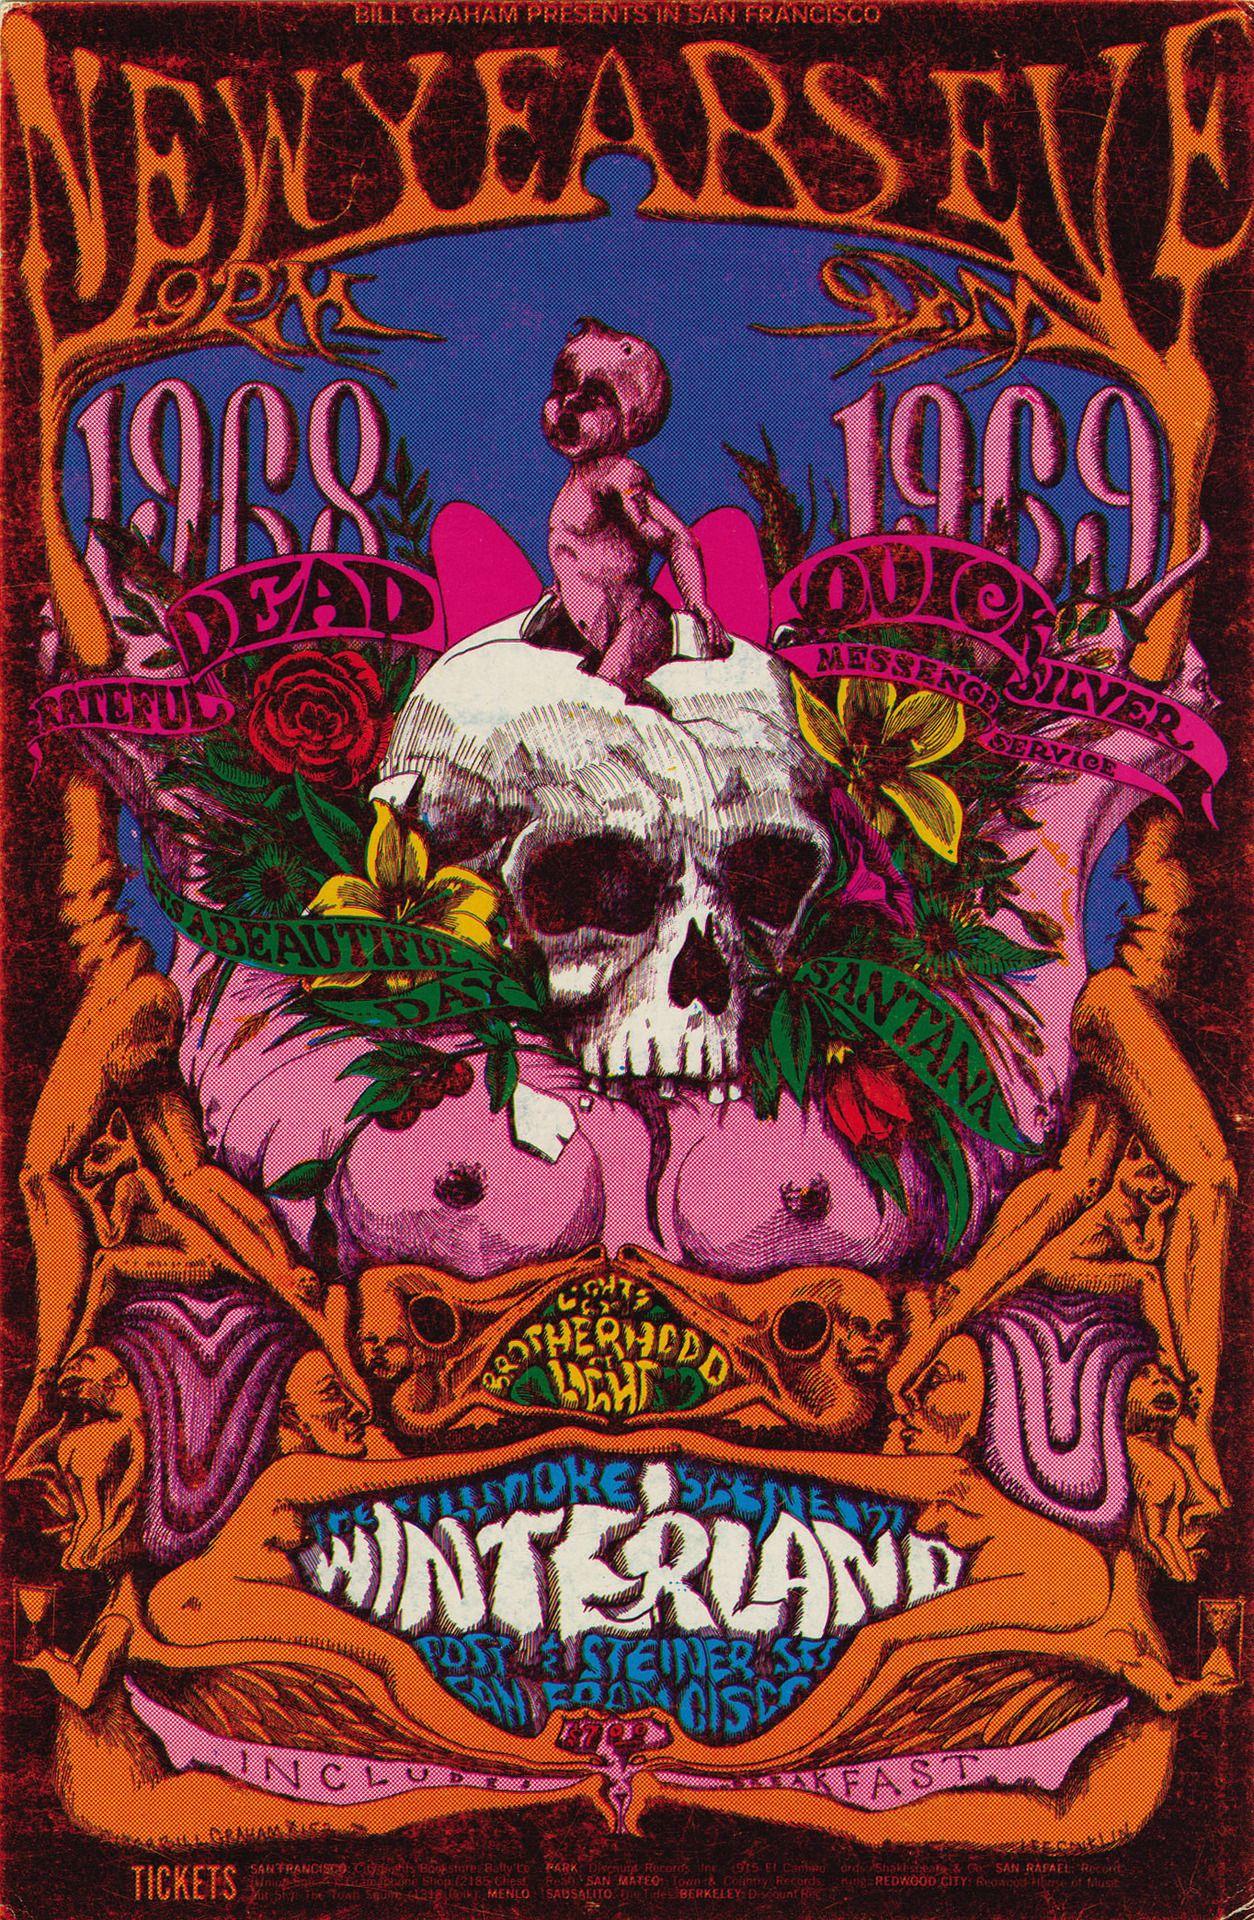 Psychedelic sixties Grateful dead poster, Concert